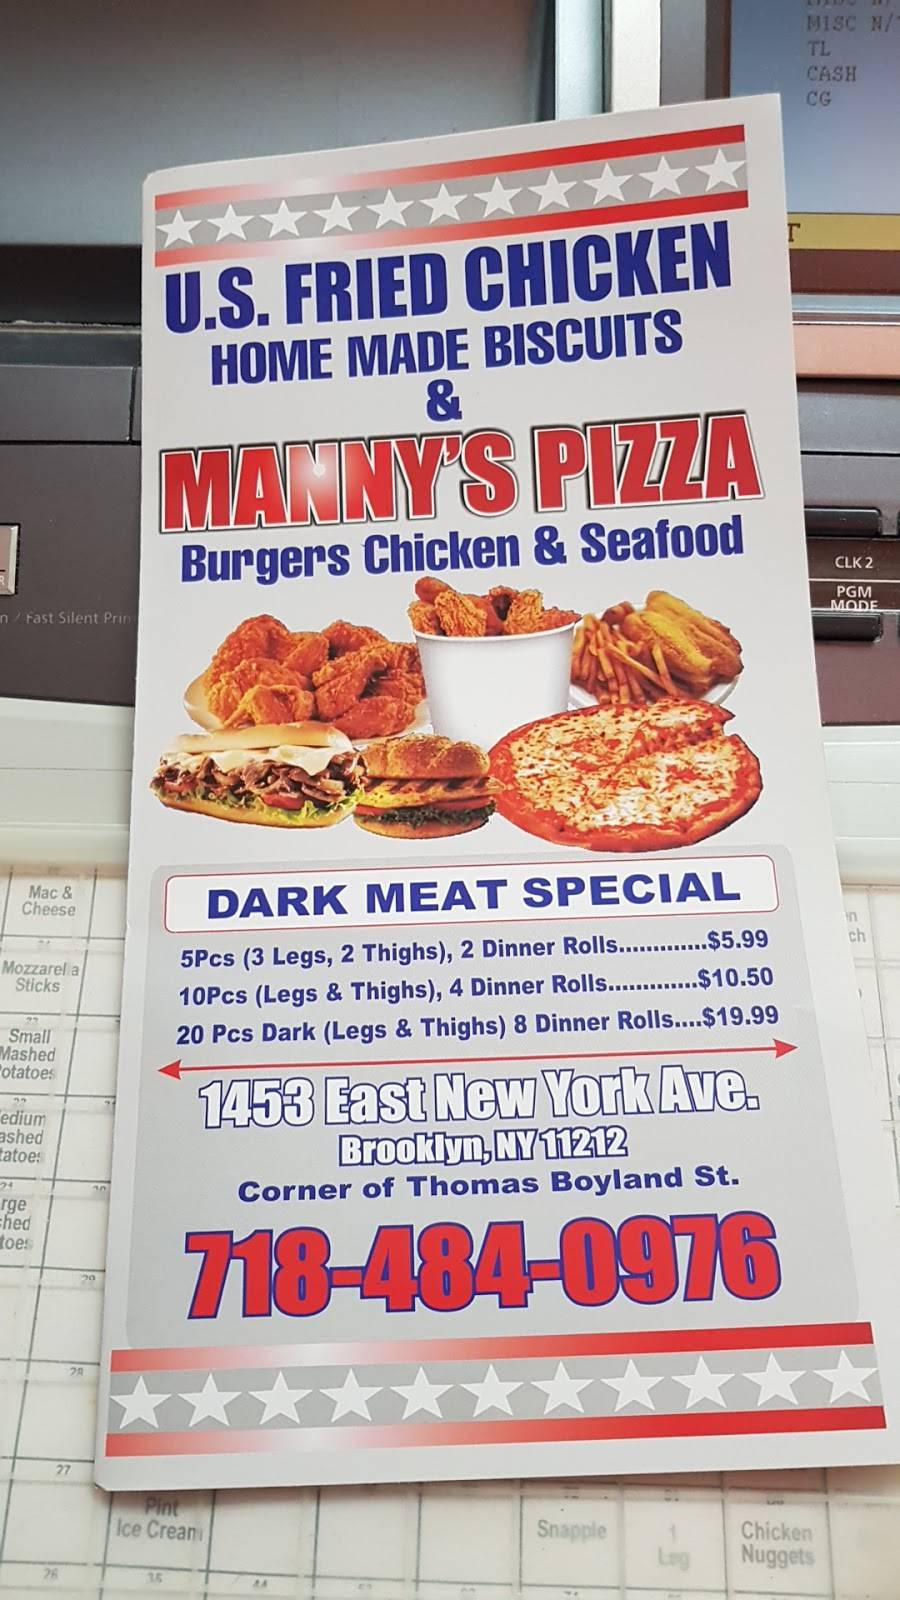 US Fried Chicken | restaurant | 1453 E New York Ave, Brooklyn, NY 11212, USA | 7184840976 OR +1 718-484-0976